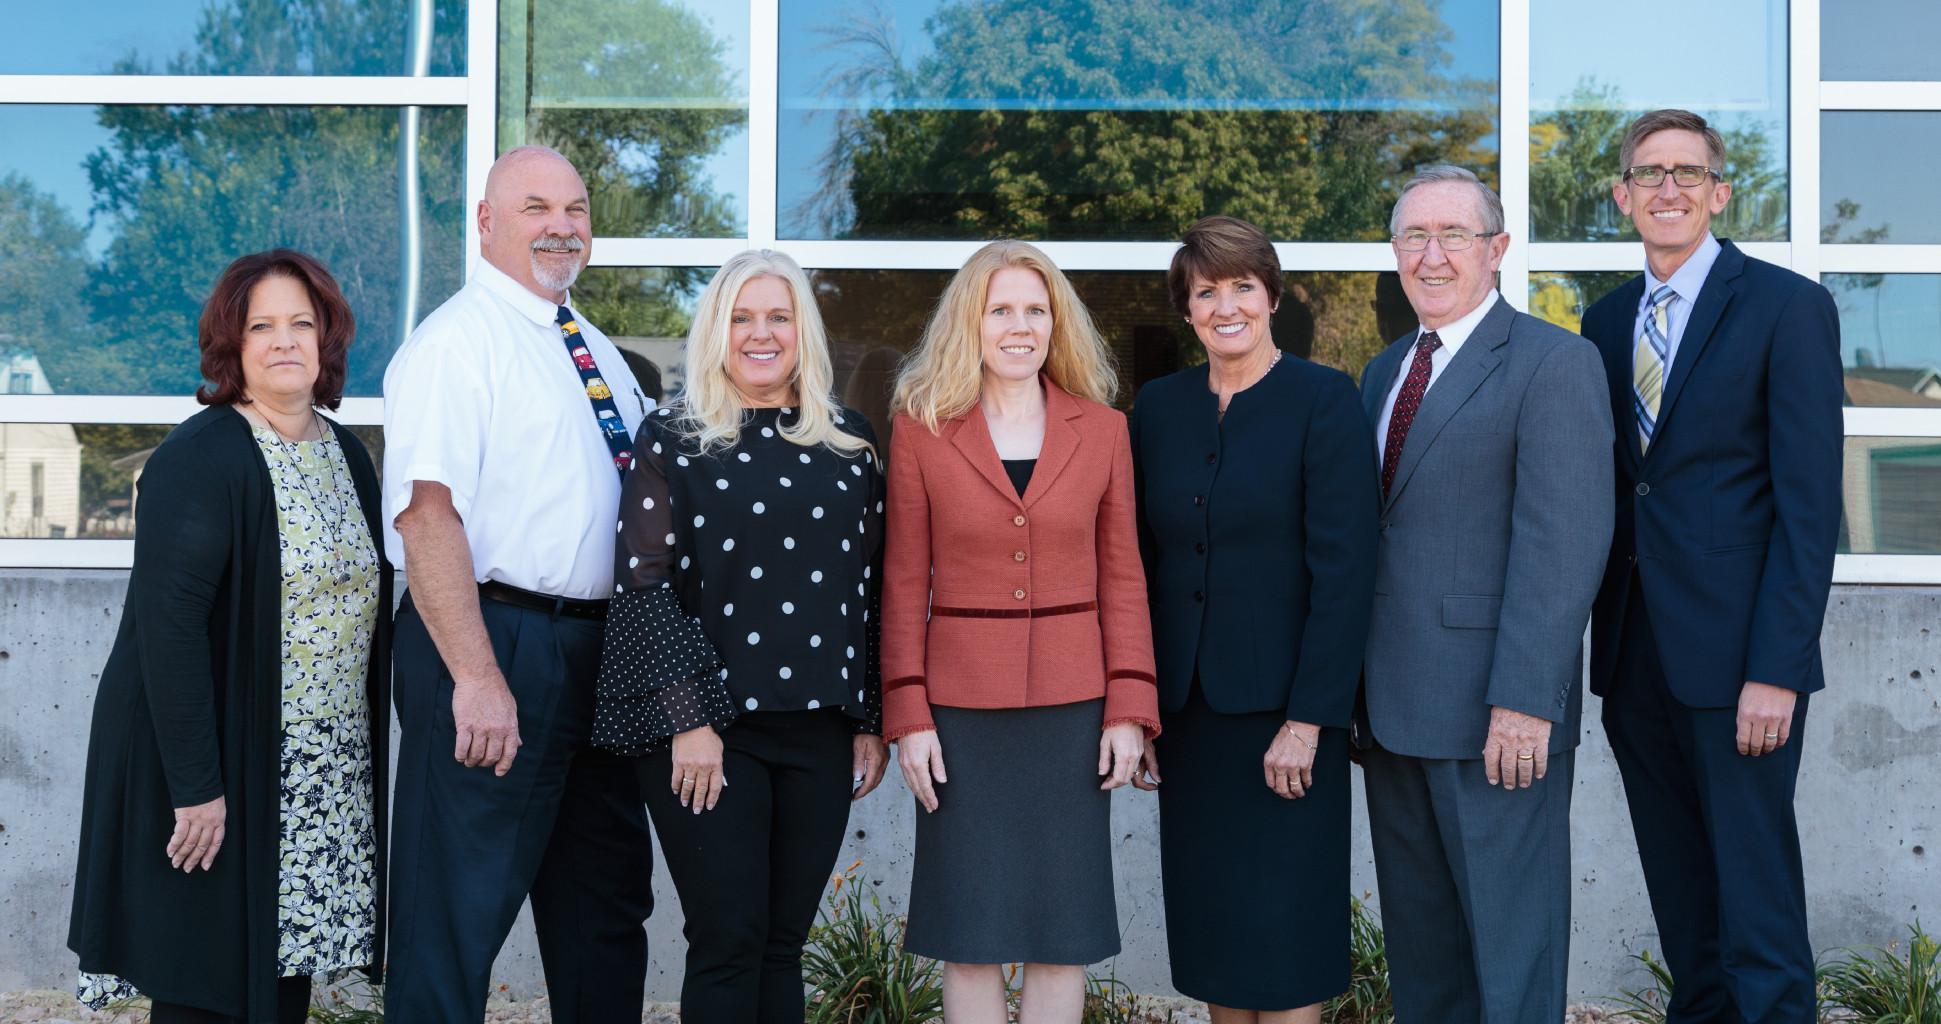 Iron County School Board